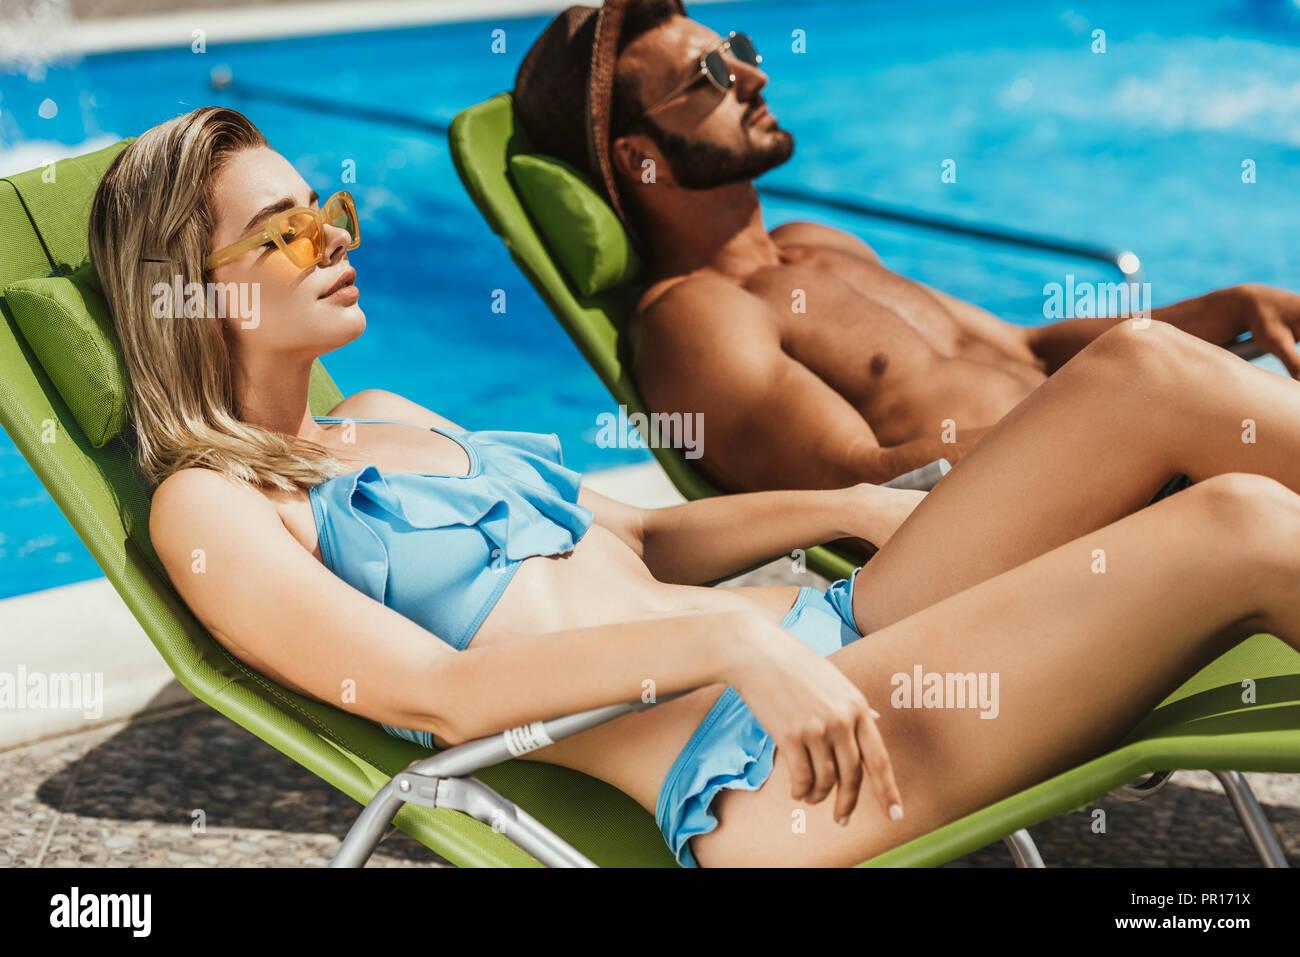 beautiful young couple sunbathing on sunbeds at poolside - Stock Image